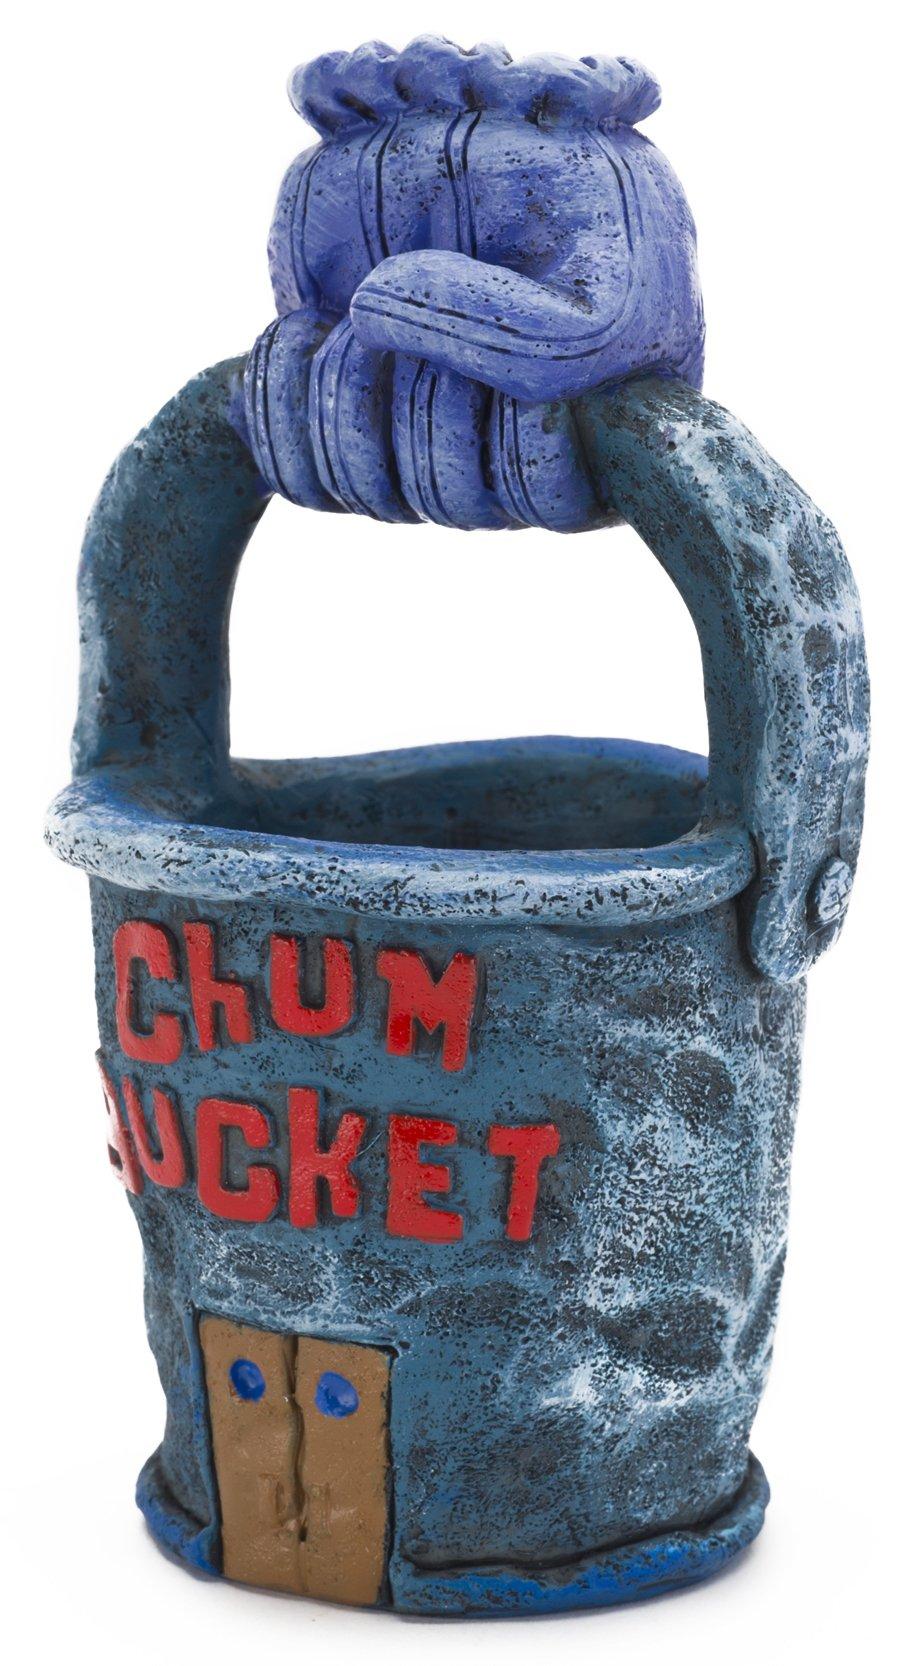 Spongebob Squarepants Chum Bucket Aquarium Ornament, 4.25 by 2-1/2 by 2-1/4-Inch by Nickelodeon